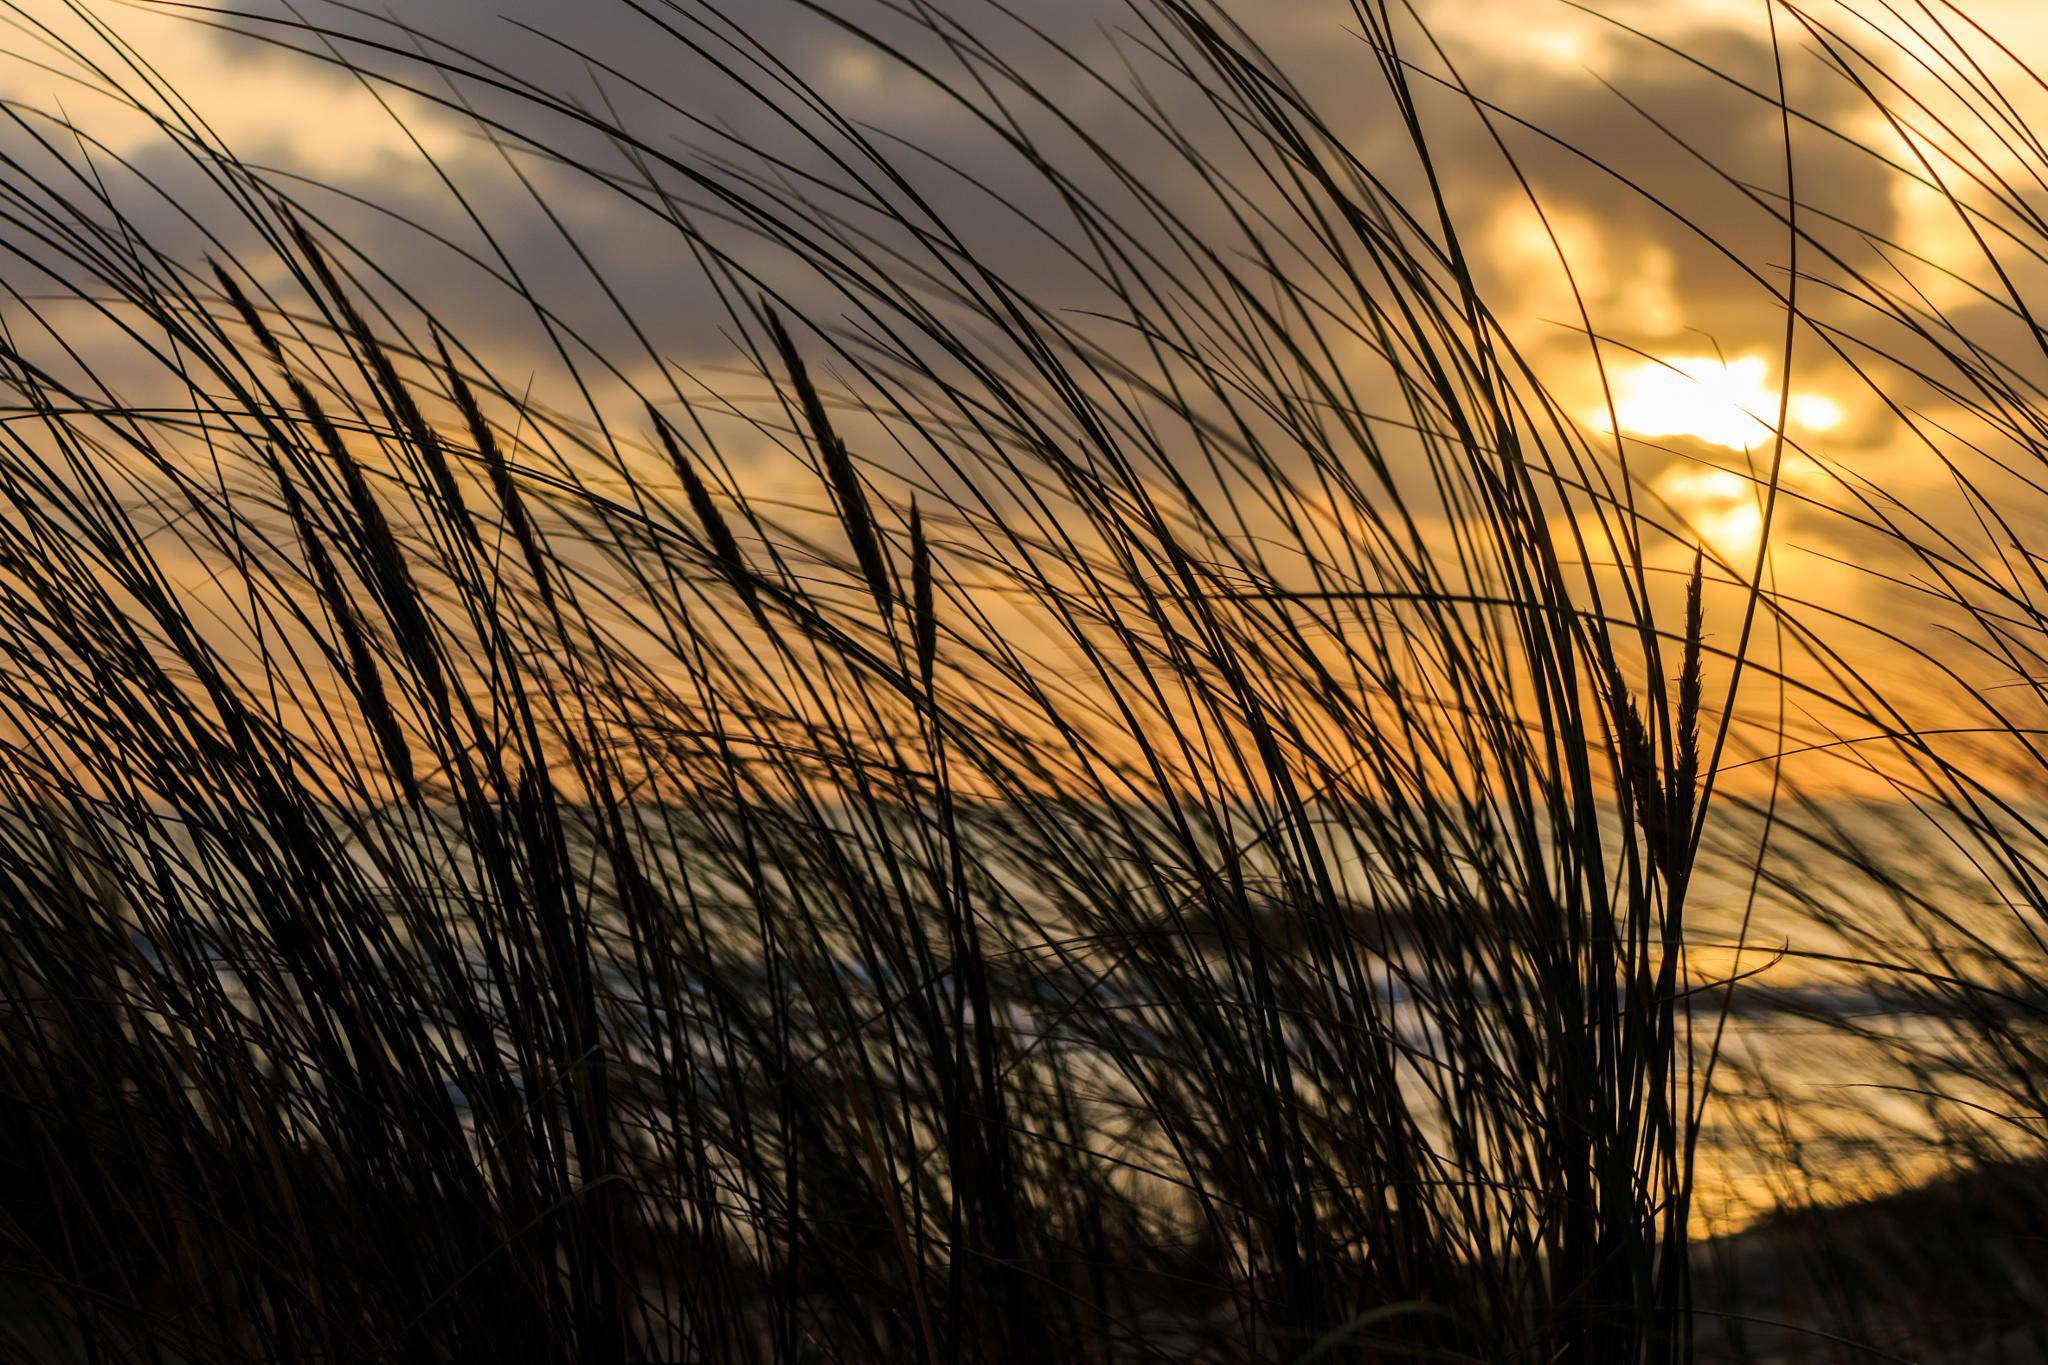 Evening Air by Laurent Adien